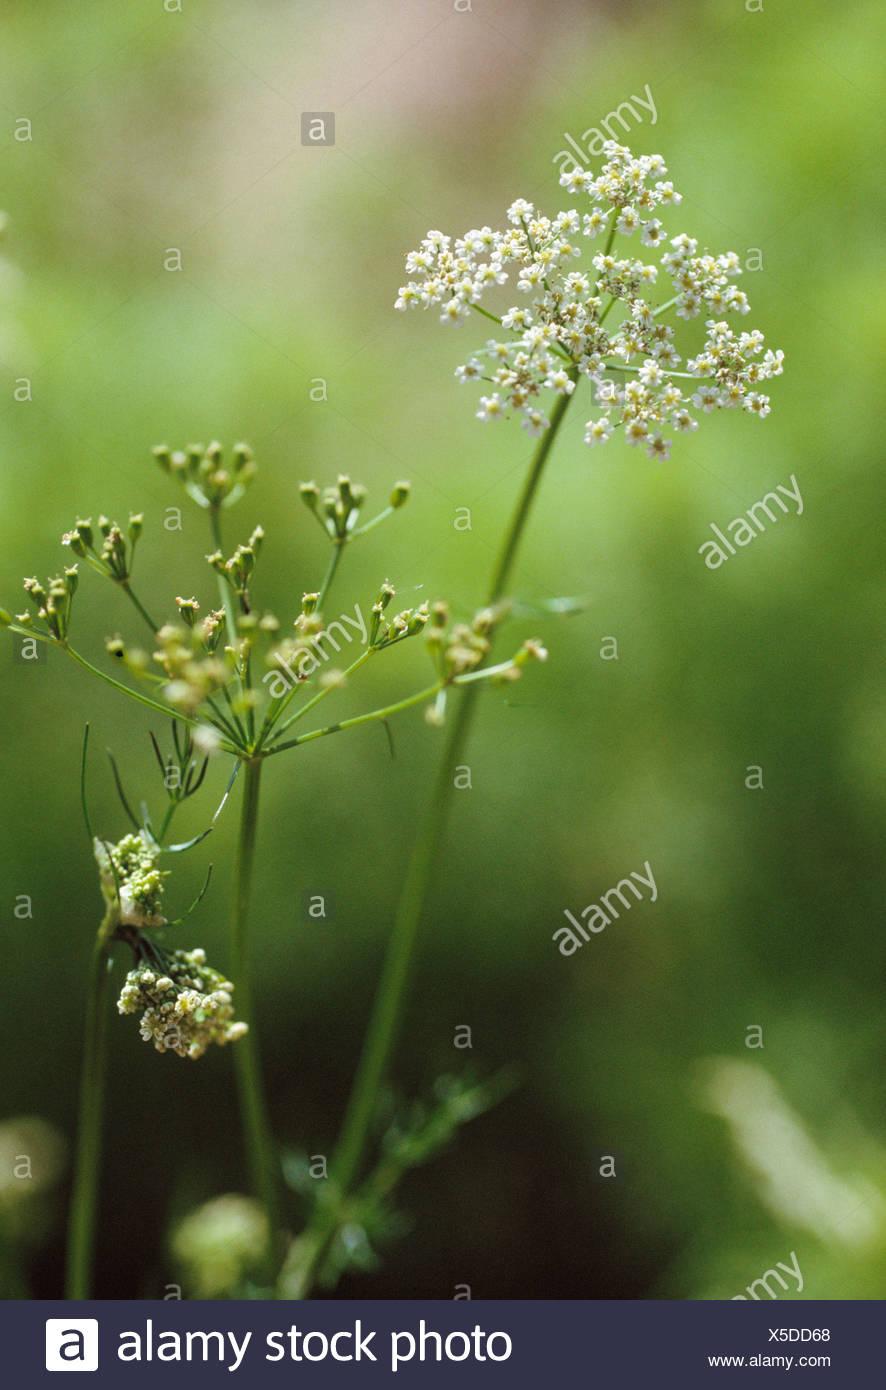 Coriander Coriandrum Sativum White Flowers On Long Stem Of Herb